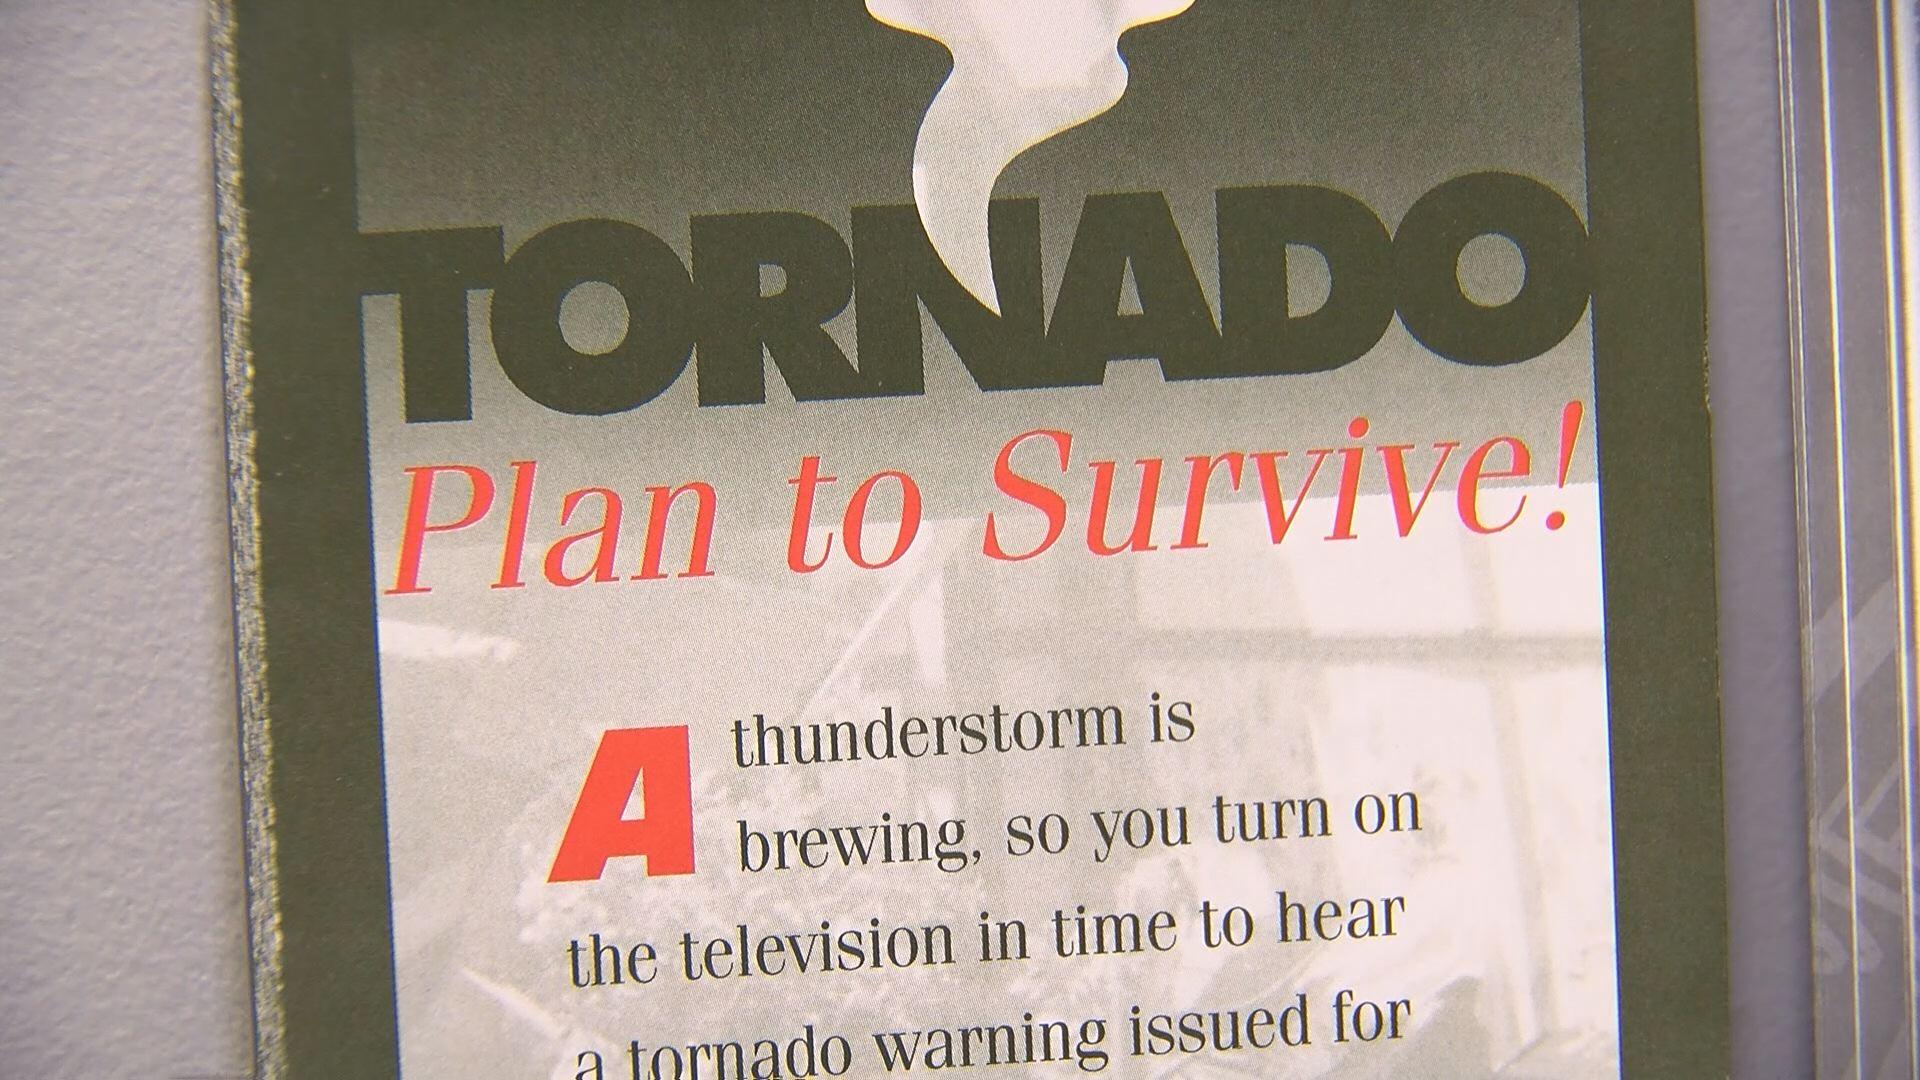 mobile home tornado safety_413079